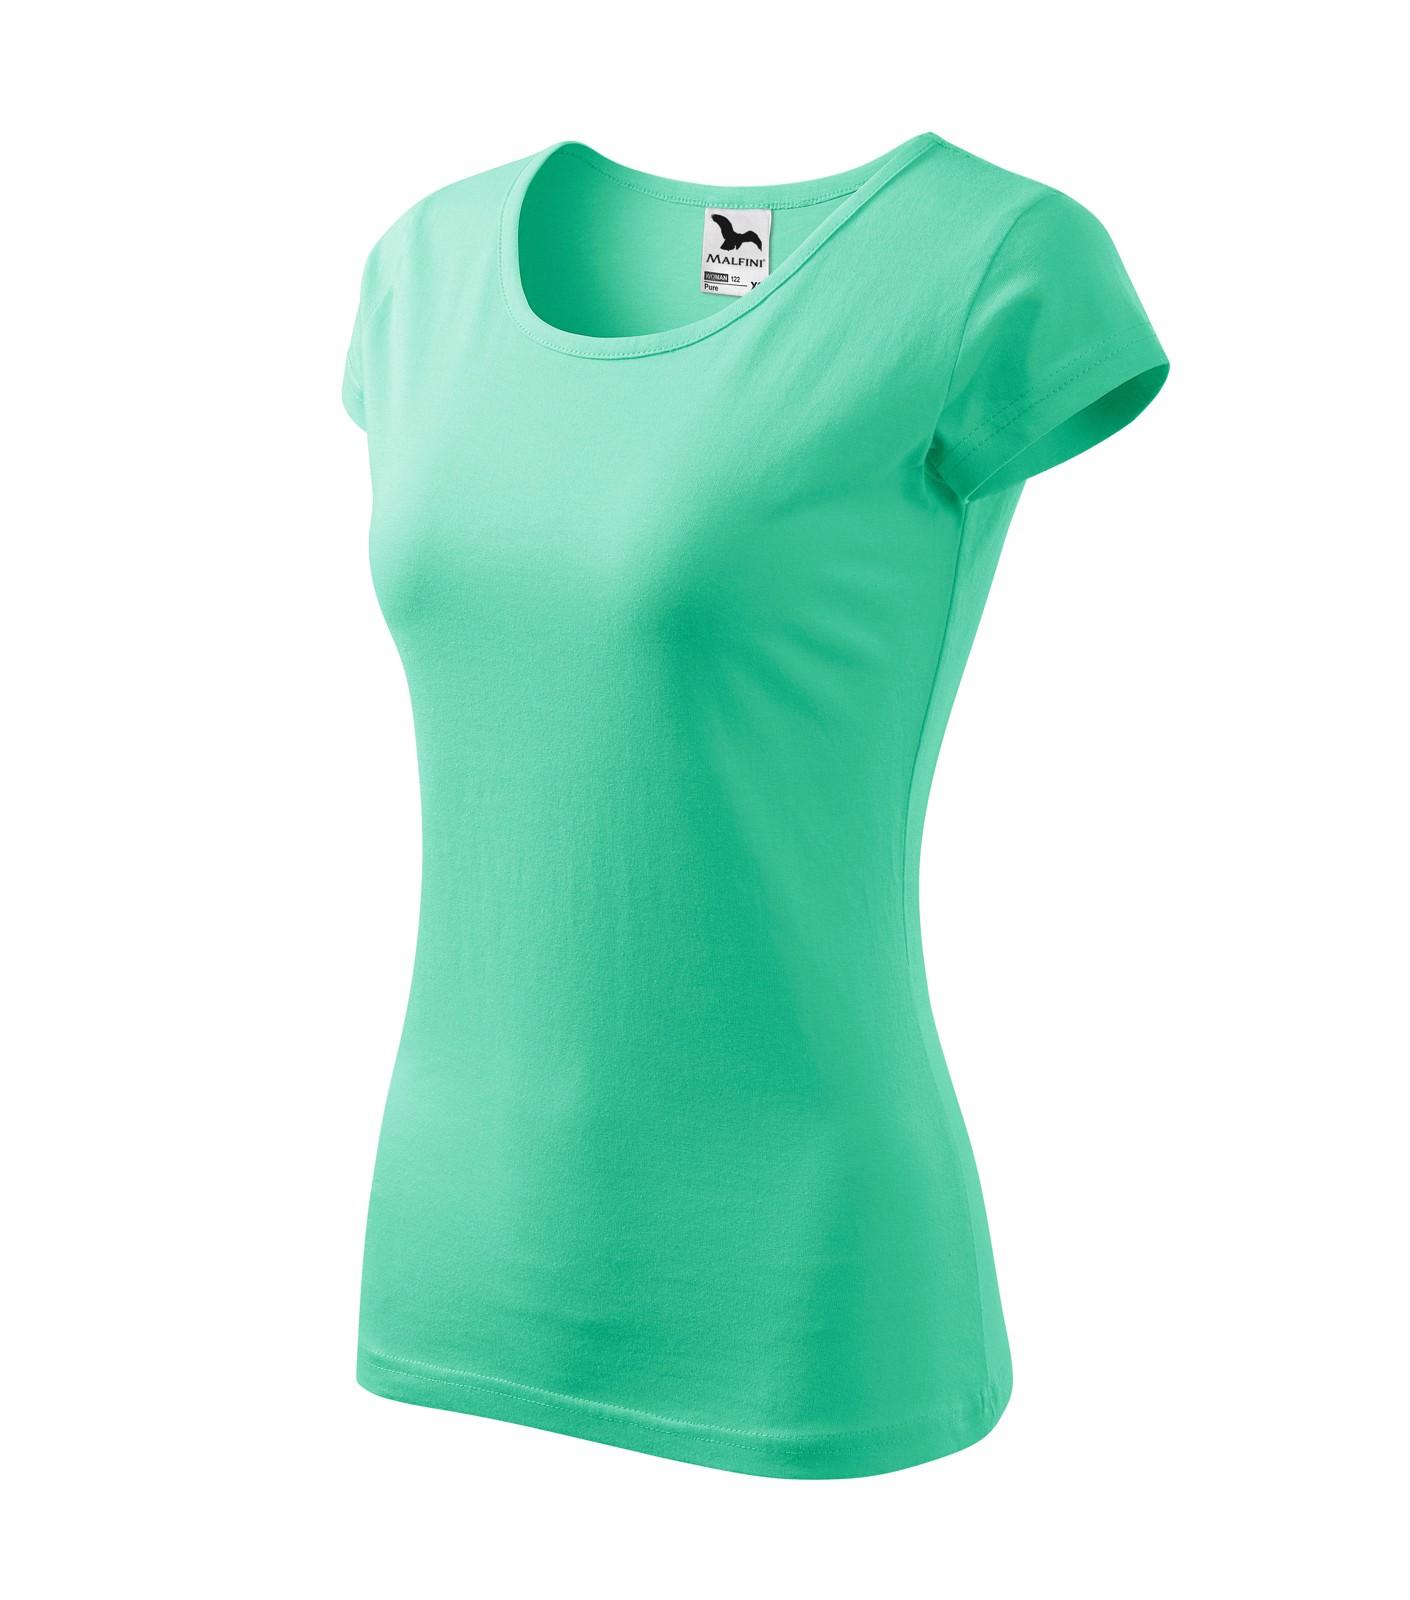 T-shirt women's Malfini Pure - Mint / L